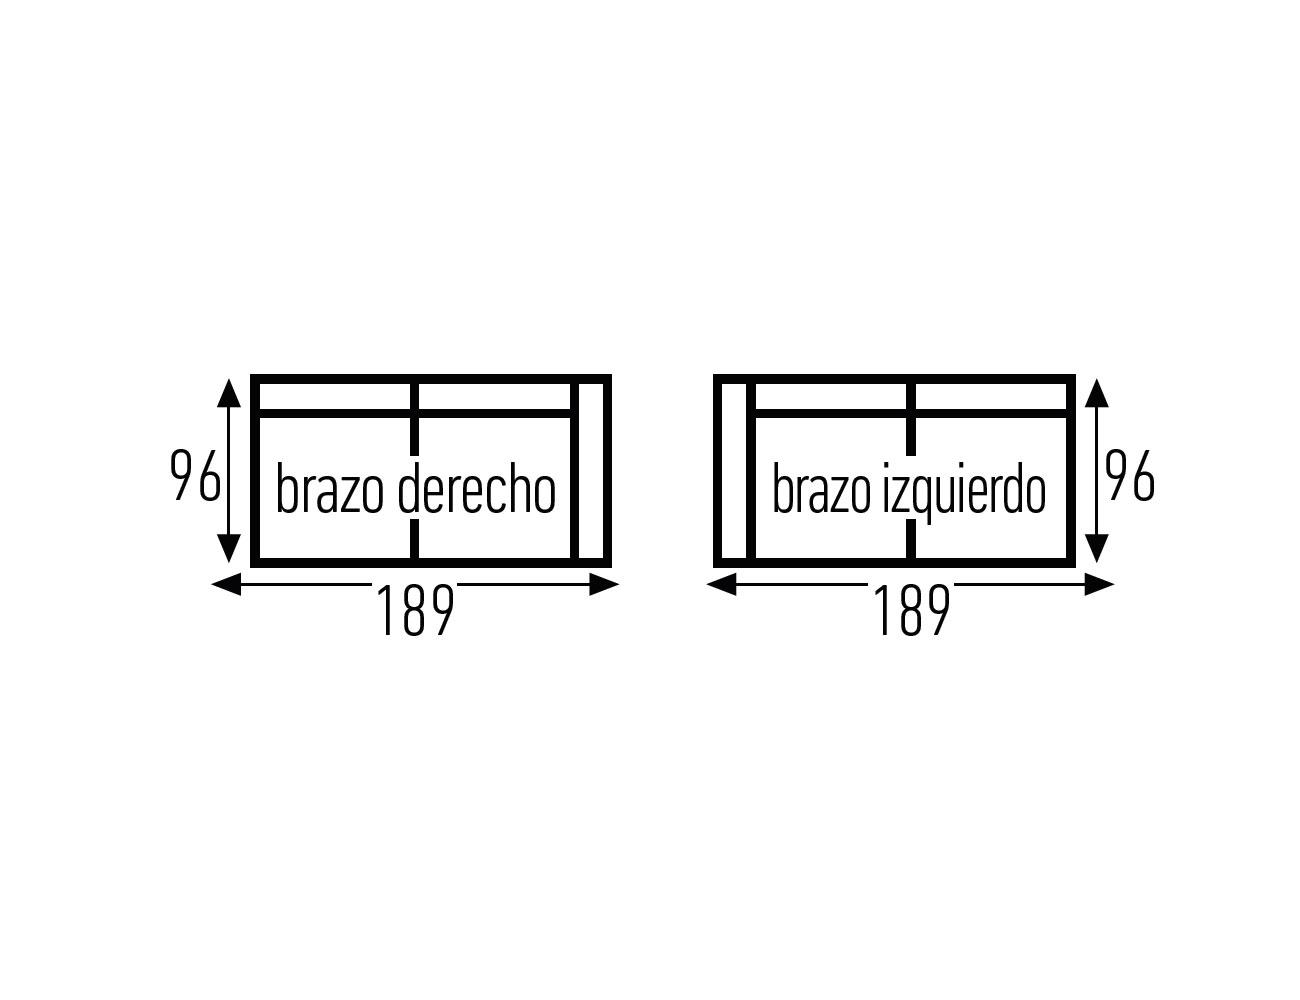 Croquis 3p sin 1 brazo 18921